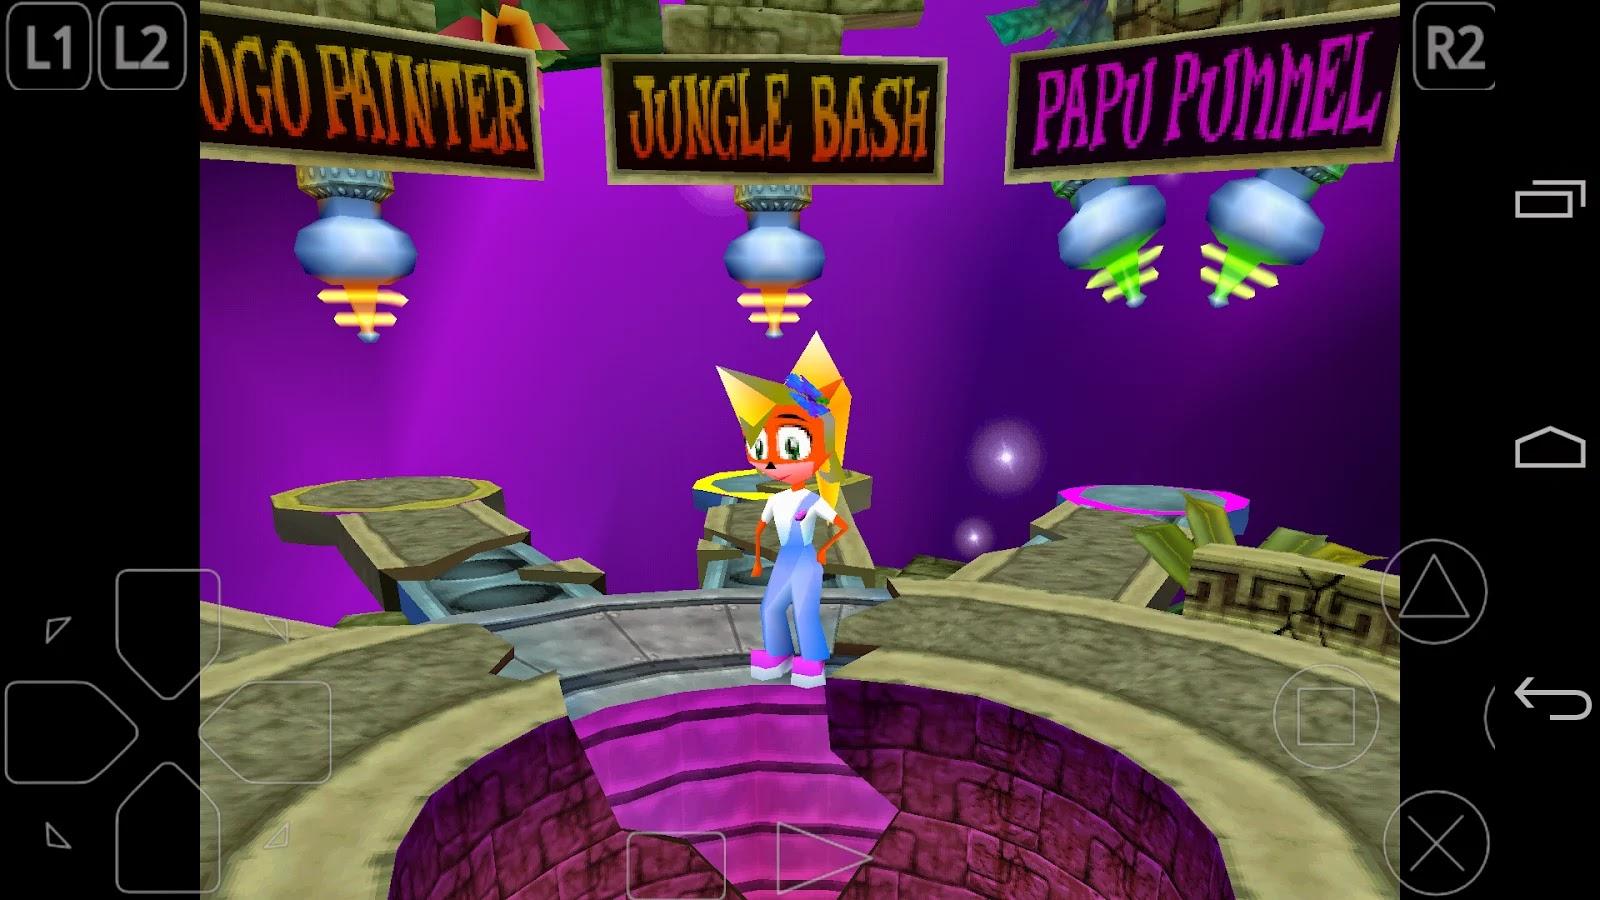 ePSXe[Playstation Emulator] 1.9.20 Apk+Roms+Bios ...